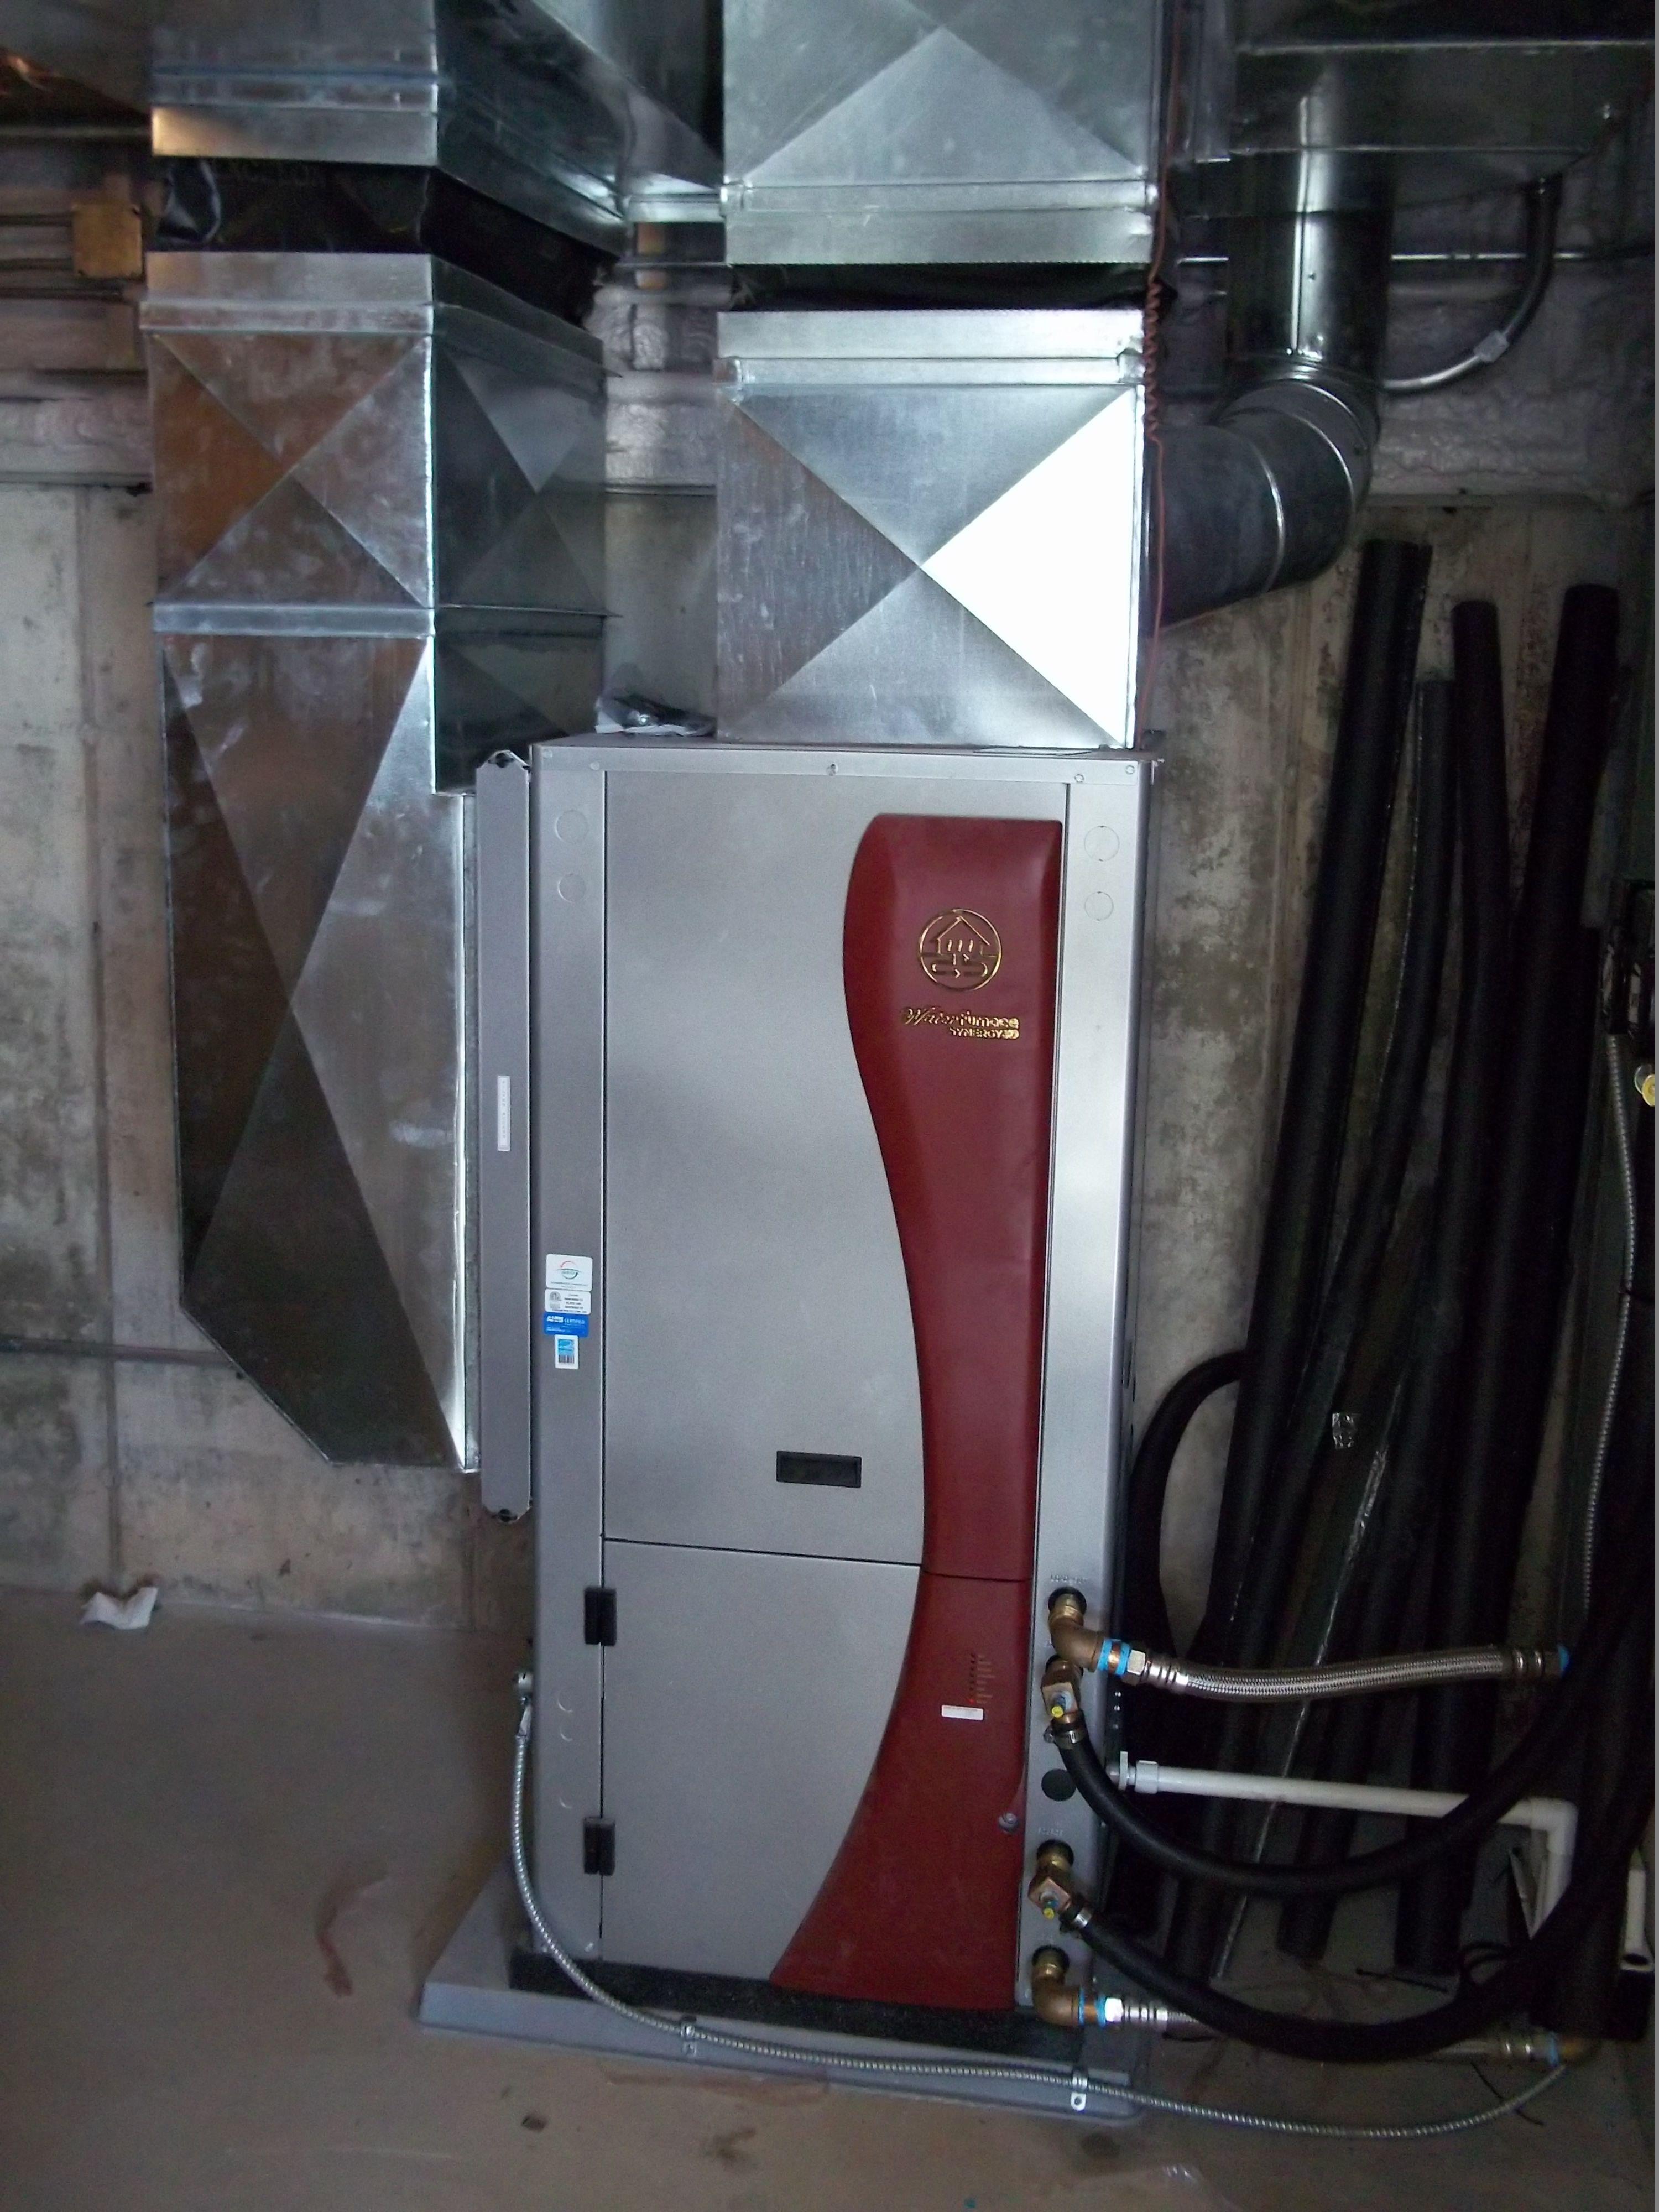 Waterfurnace Geothermal Installation Air Ease Heating And Cooling Geothermal Heating Geothermal Energy Geothermal Heating Cooling